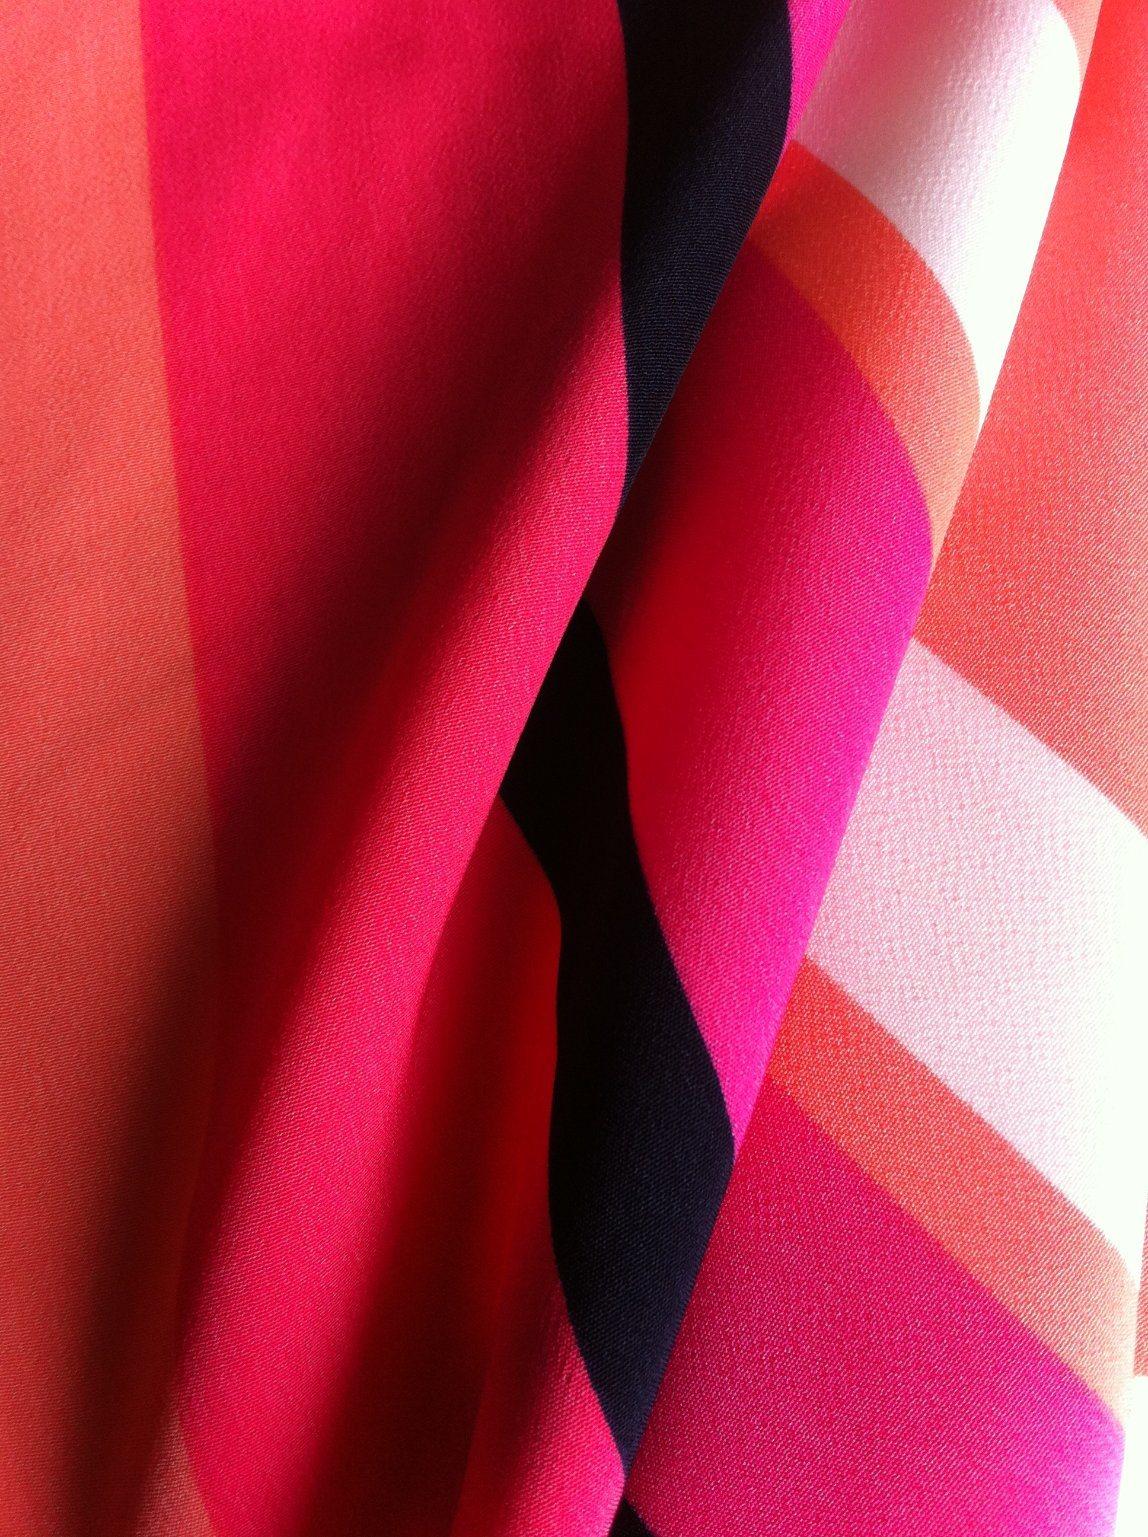 2017 China Wholesale Chiffon Dobby Fabric From China Fashion Dobby Fabric